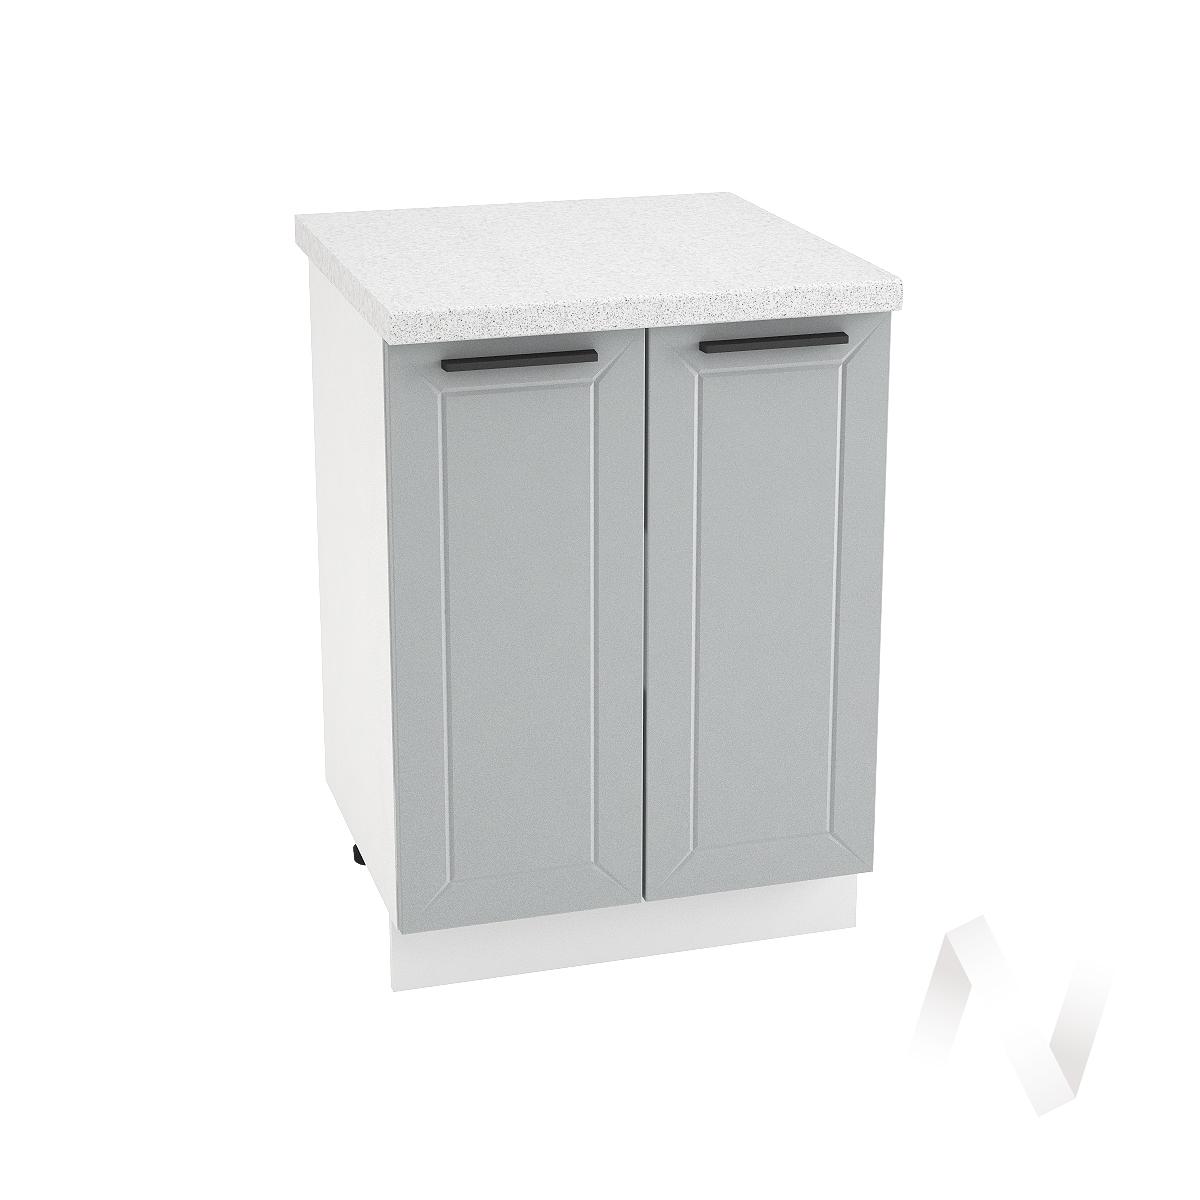 "Кухня ""Глетчер"": Шкаф нижний 600, ШН 600 (Гейнсборо Силк/корпус белый)"